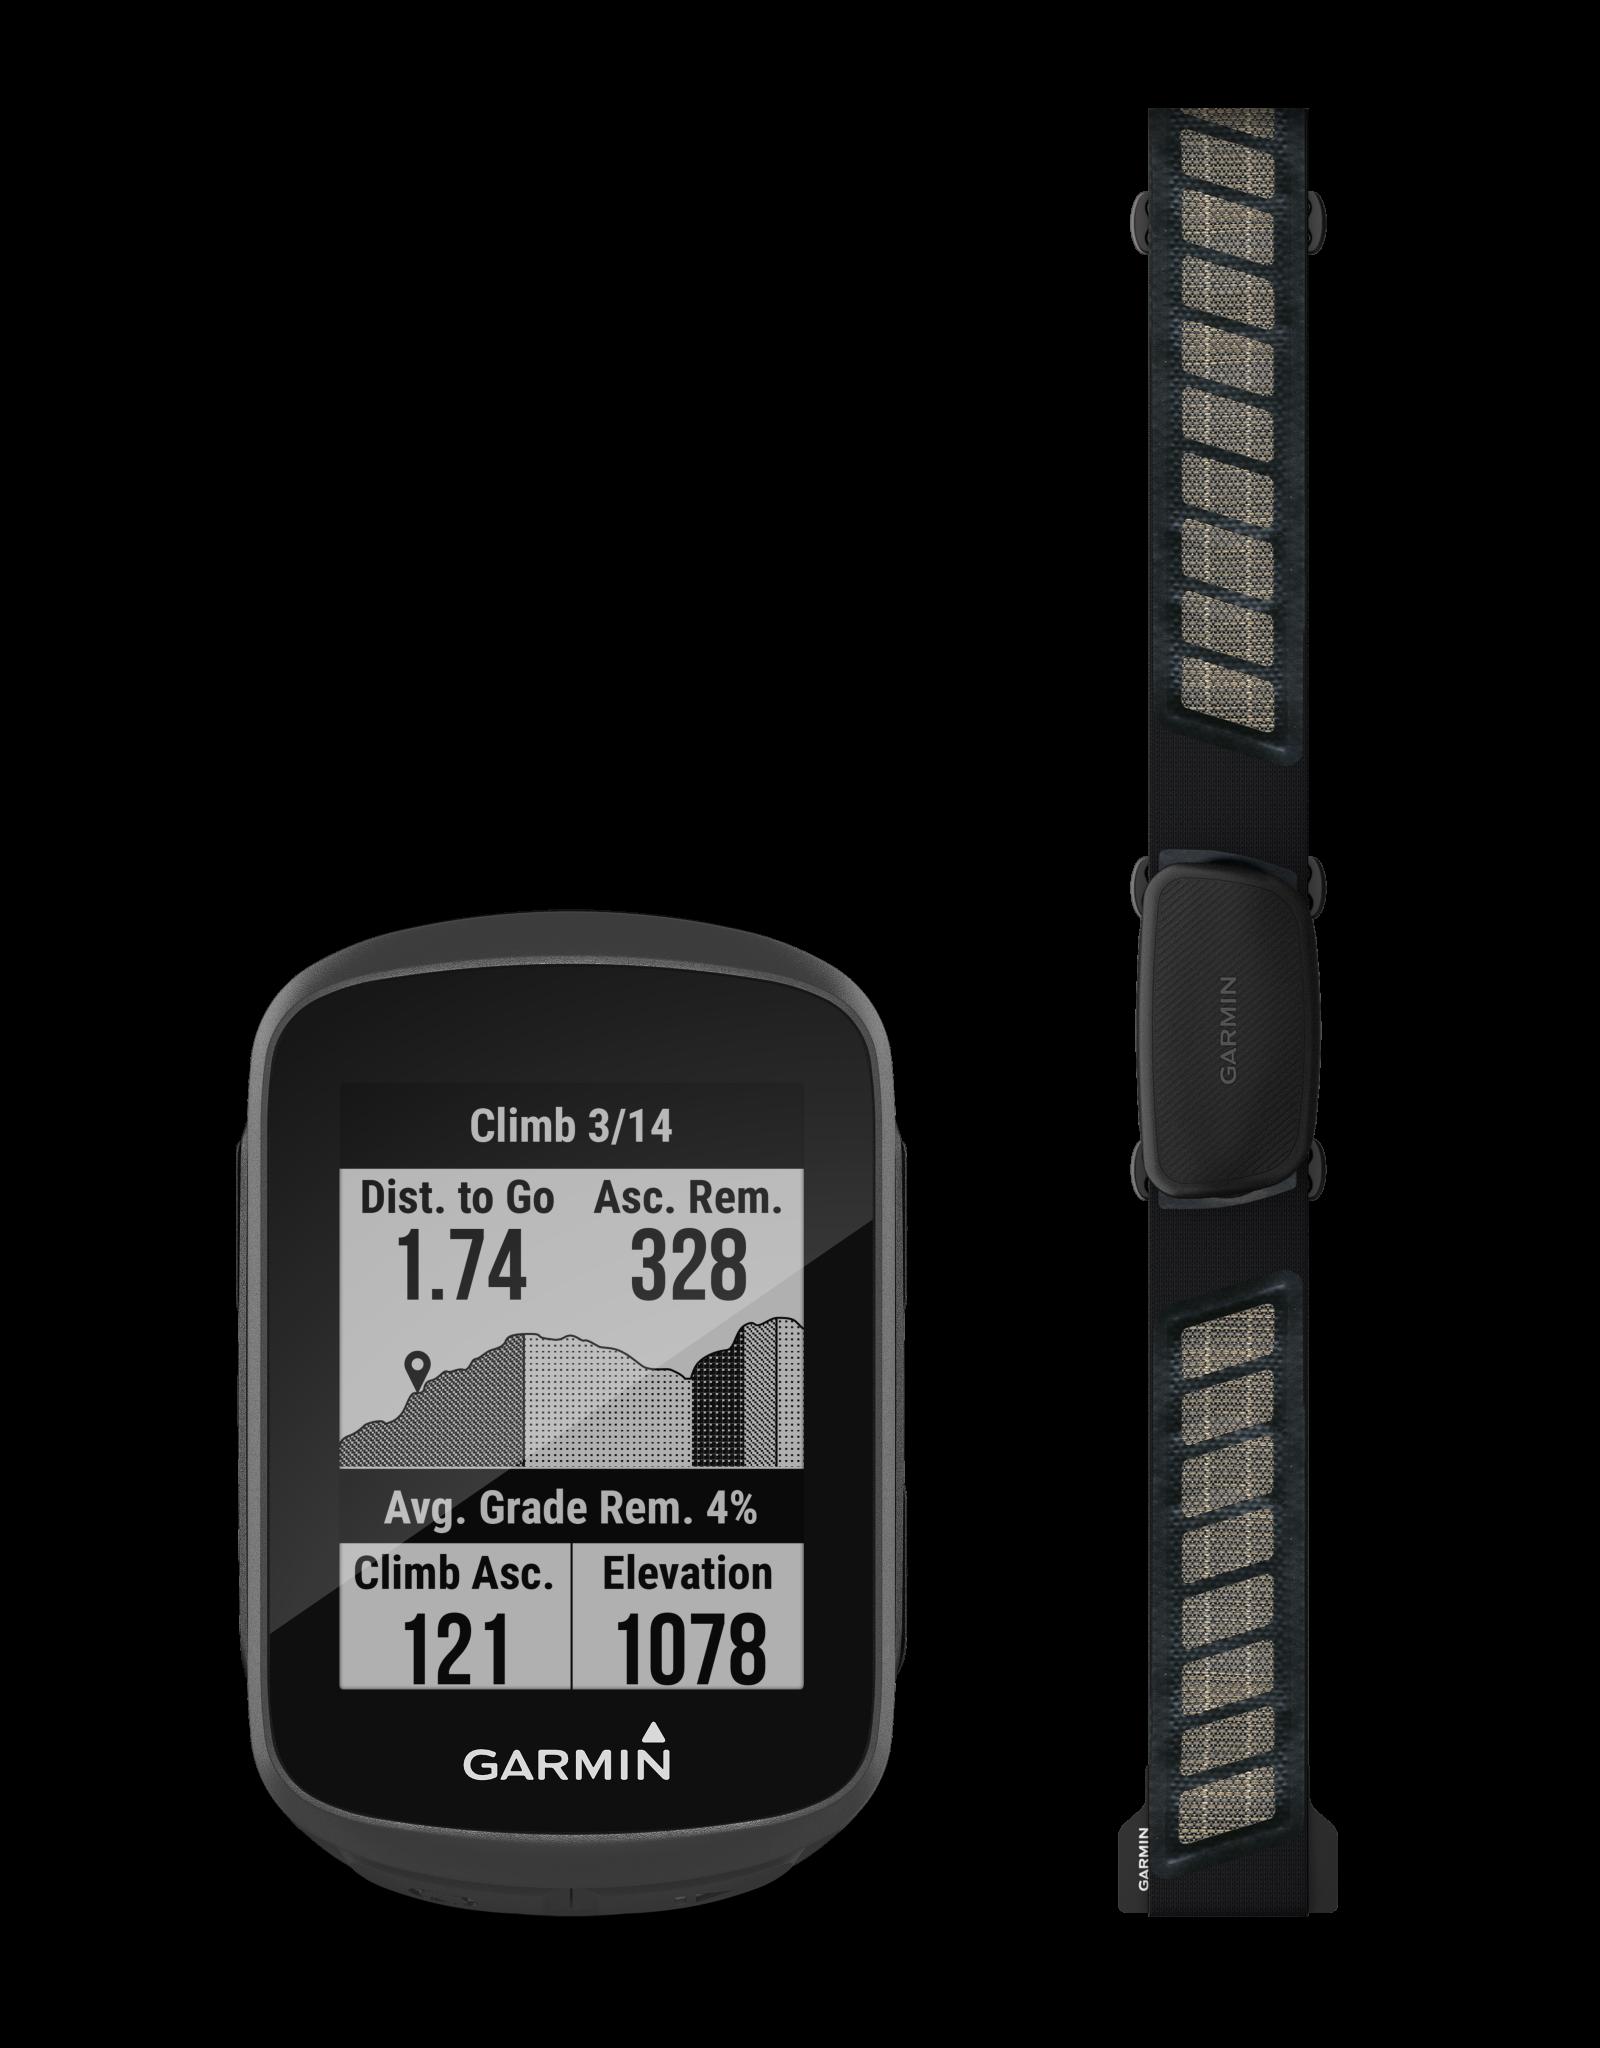 Garmin Edge 130 Plus Bike Computer - GPS, Wireless, Black